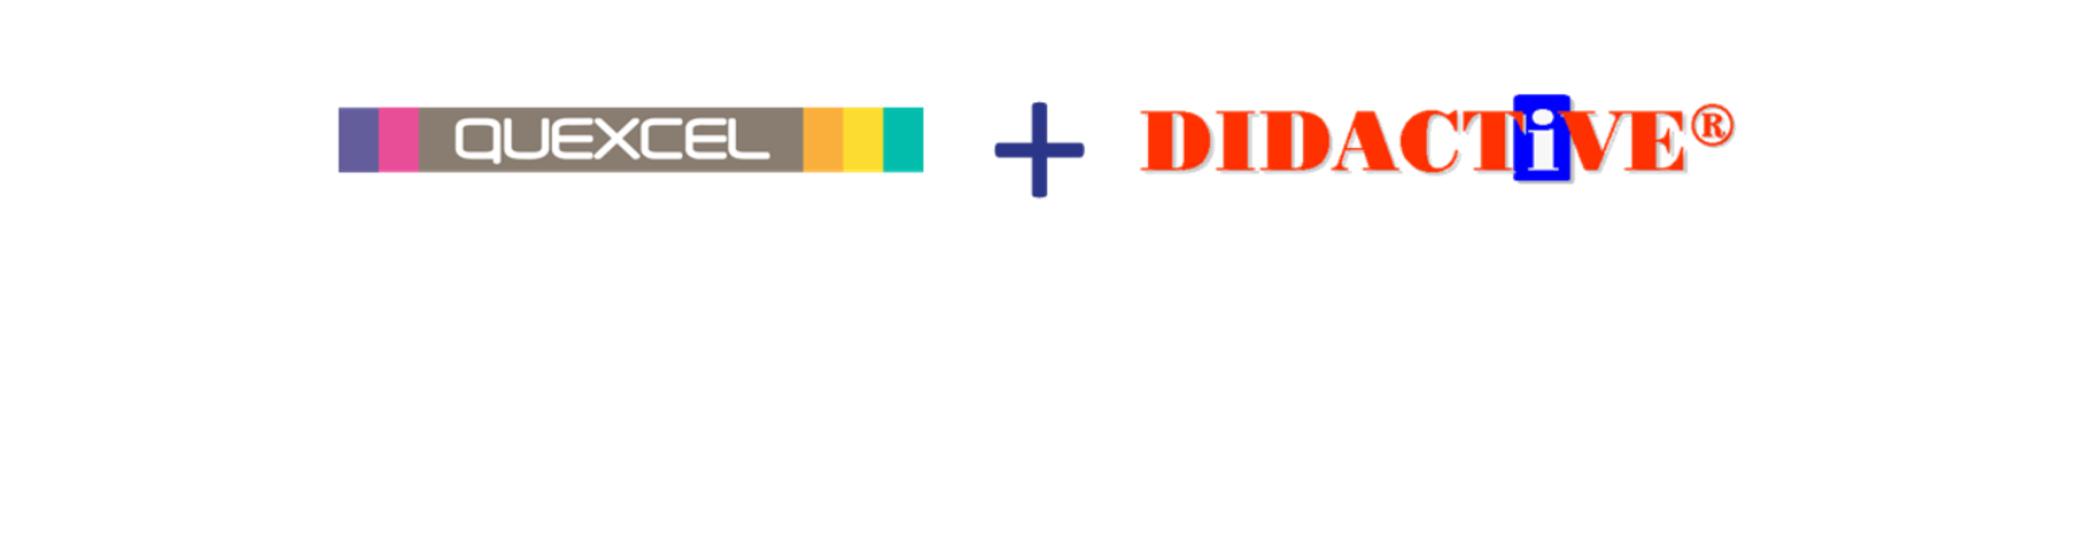 Quexcel acquires Didactive per January 1. 2021